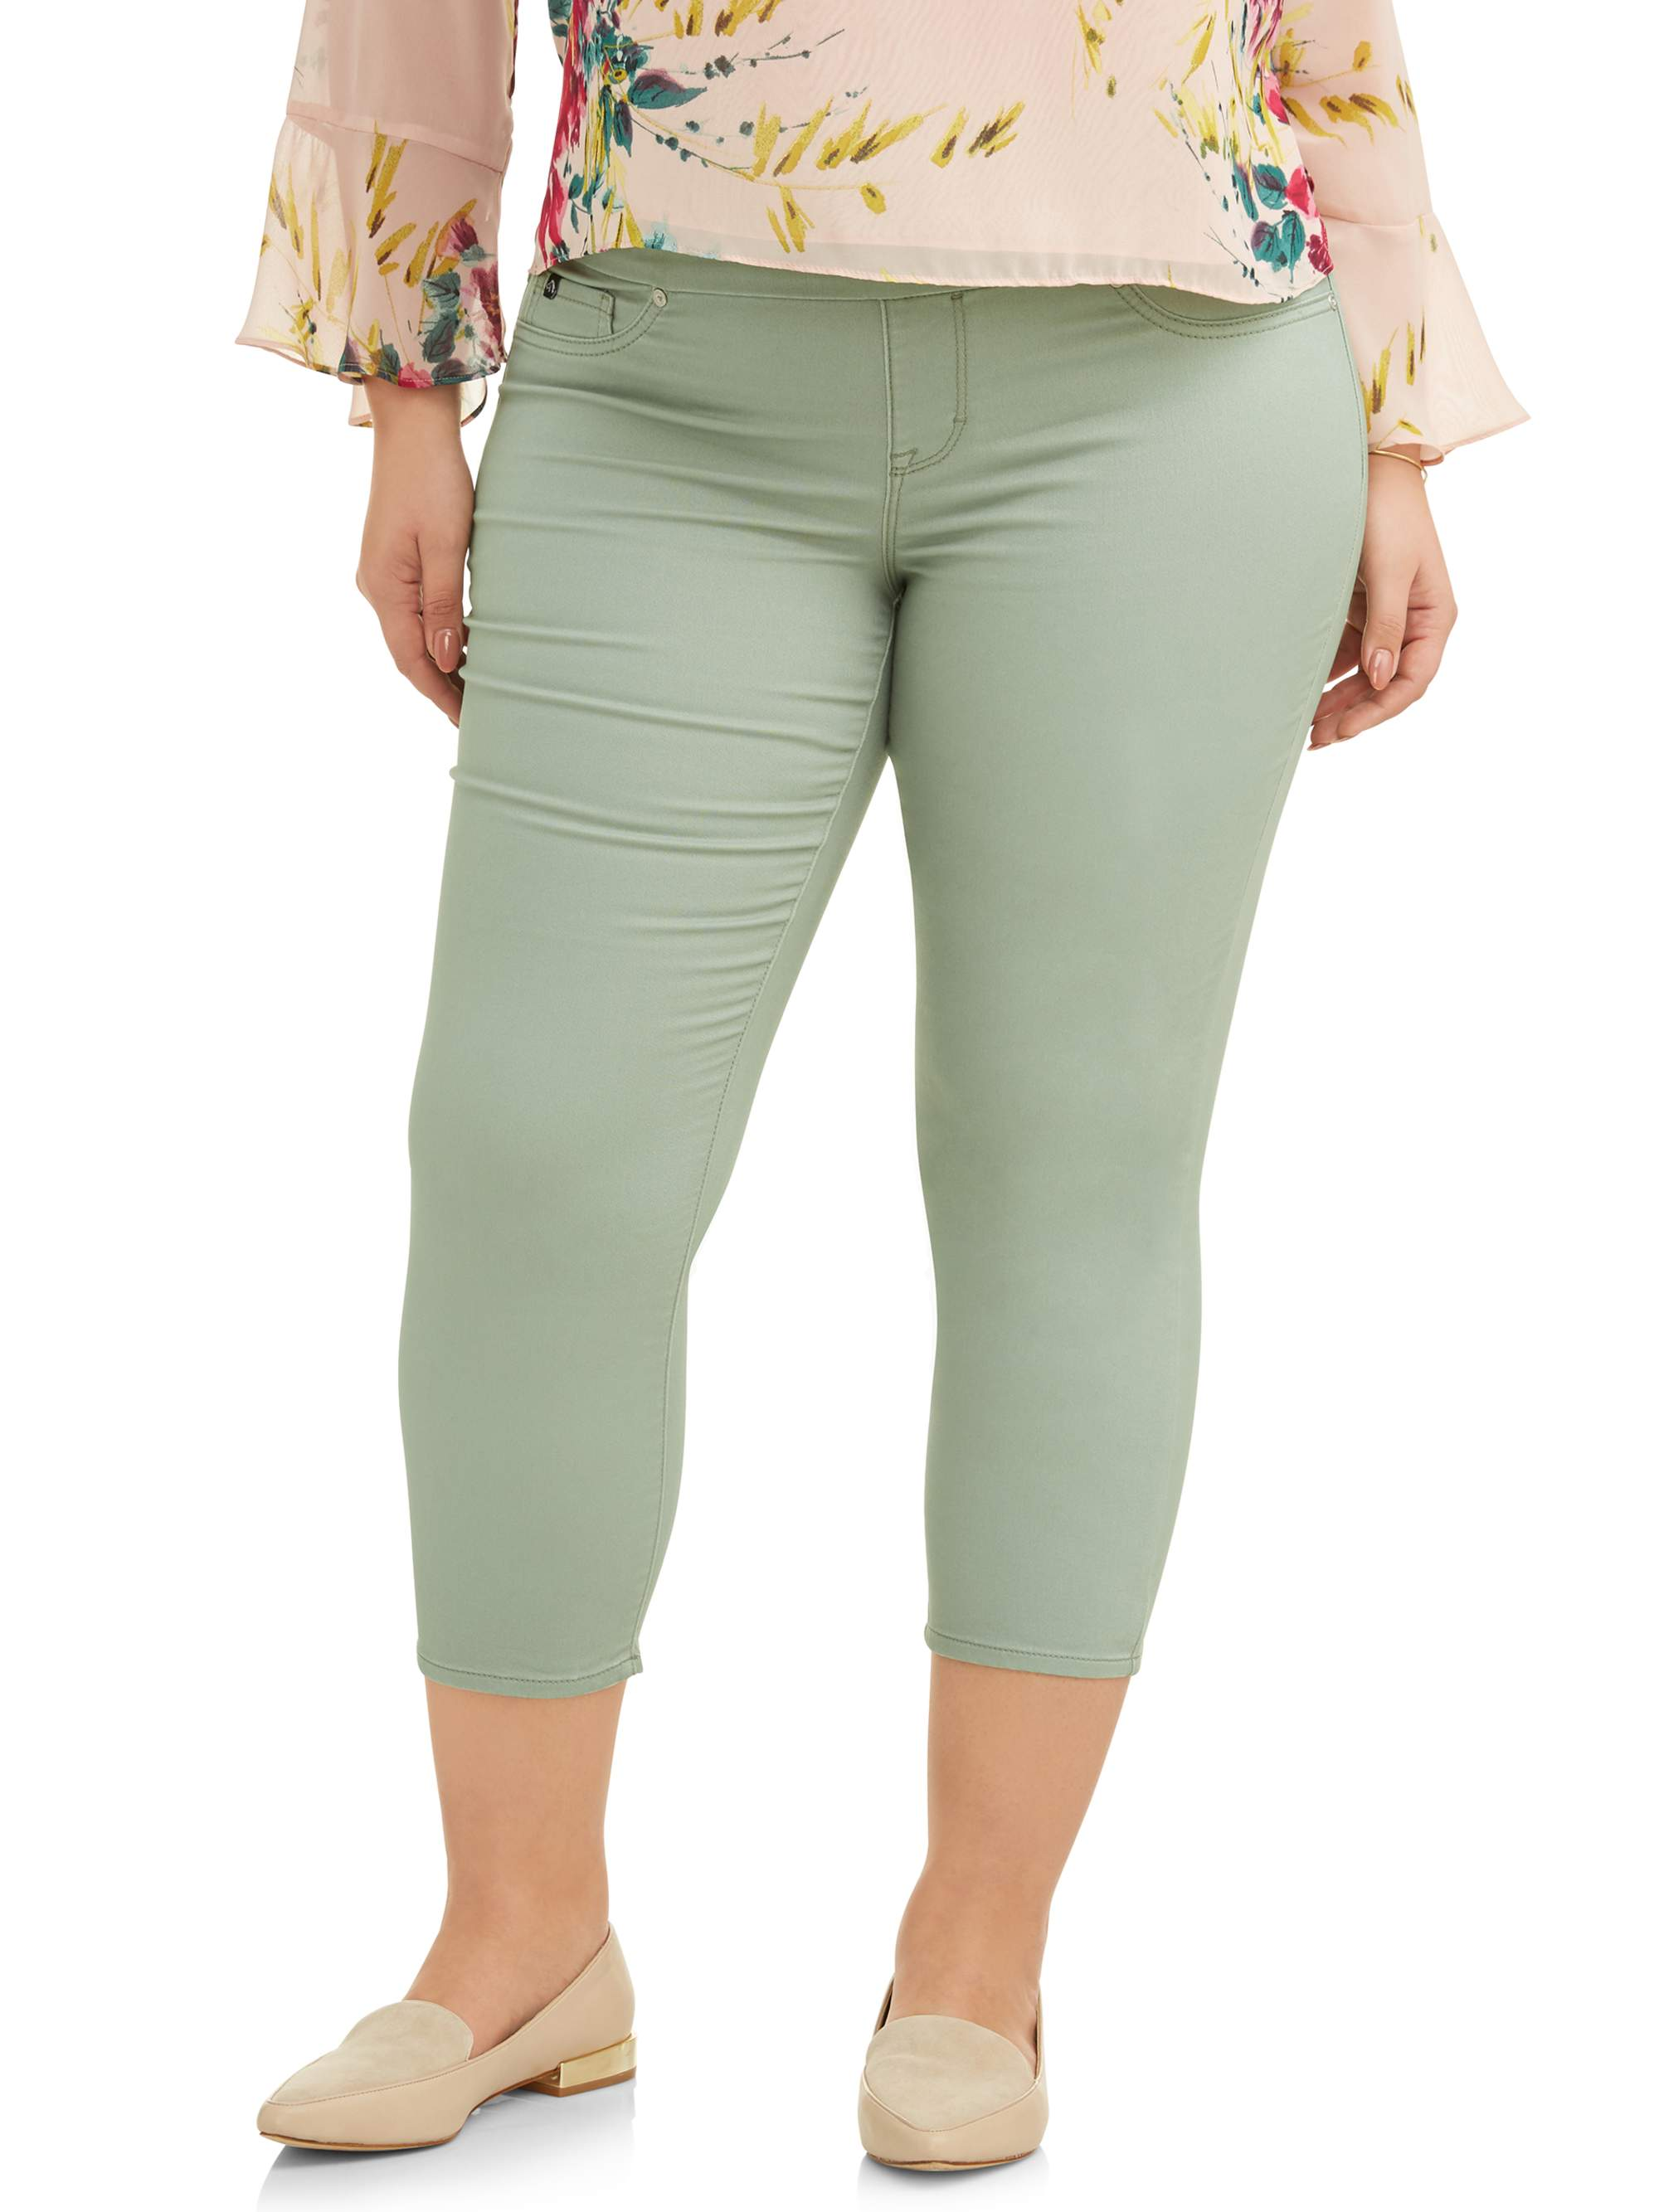 Women's Plus Wide Waistband Pull on Legging Crop